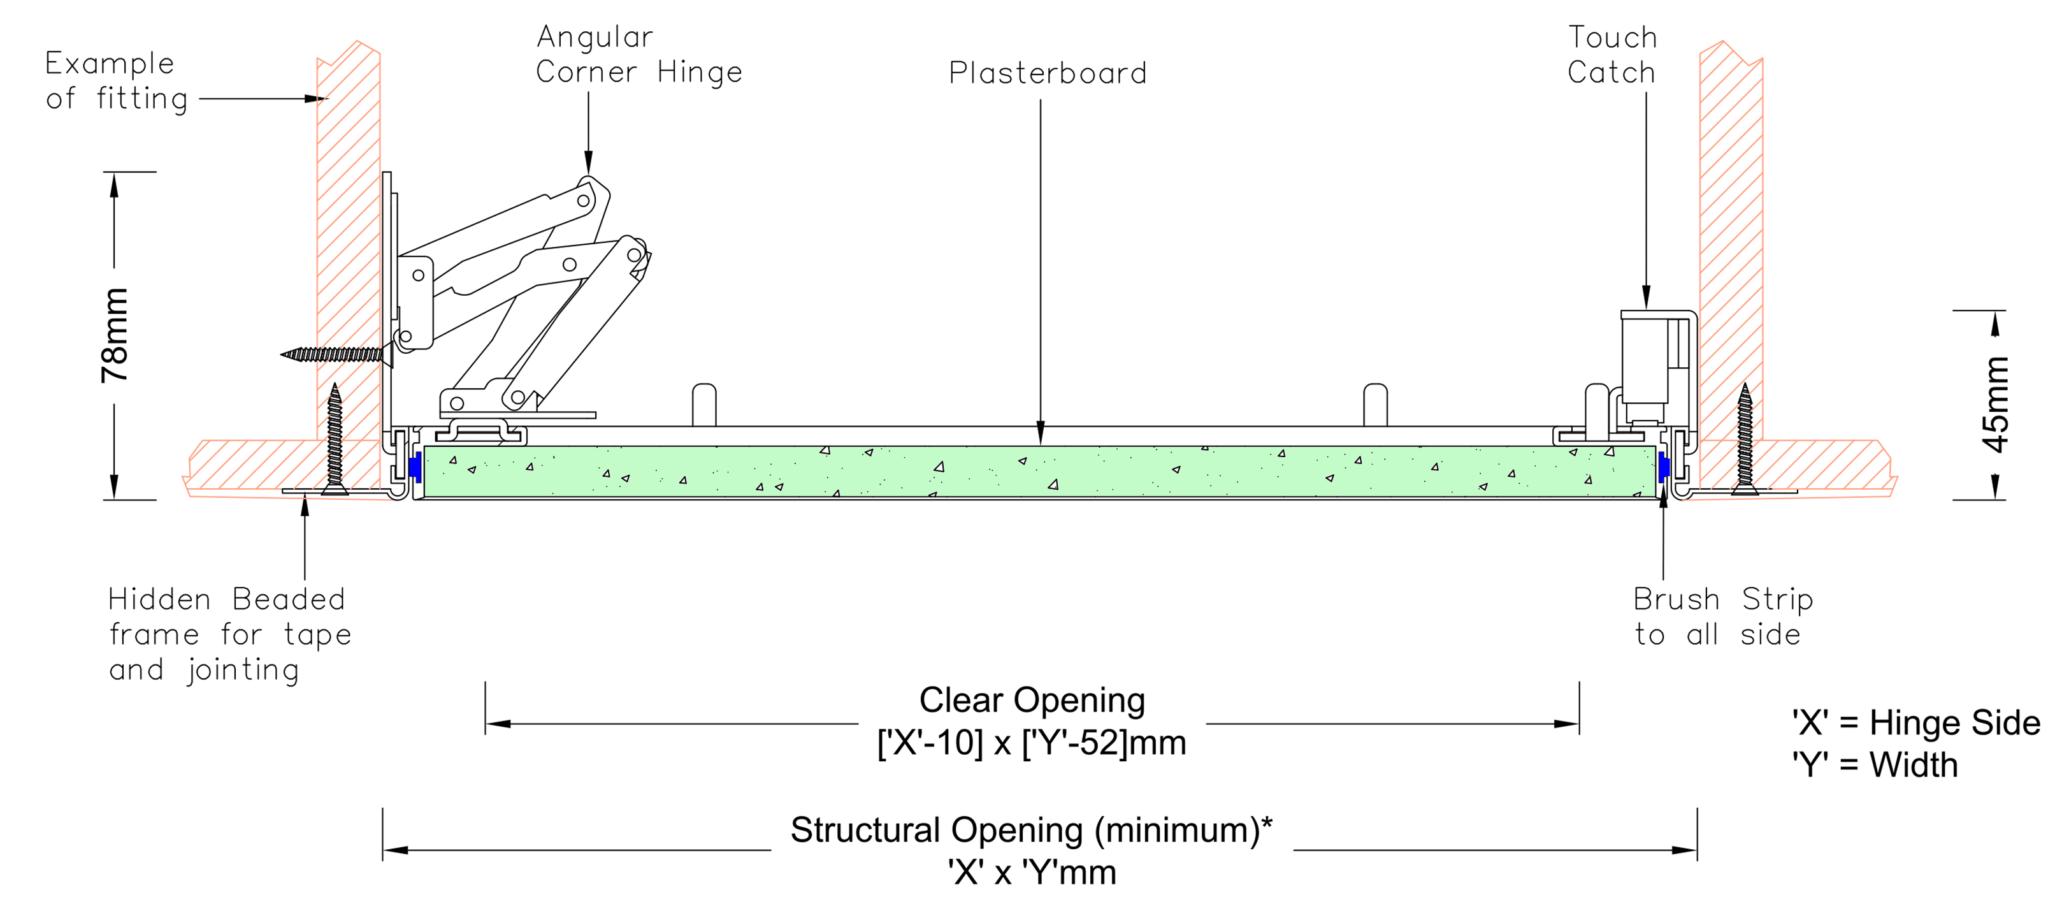 VR PB drawing